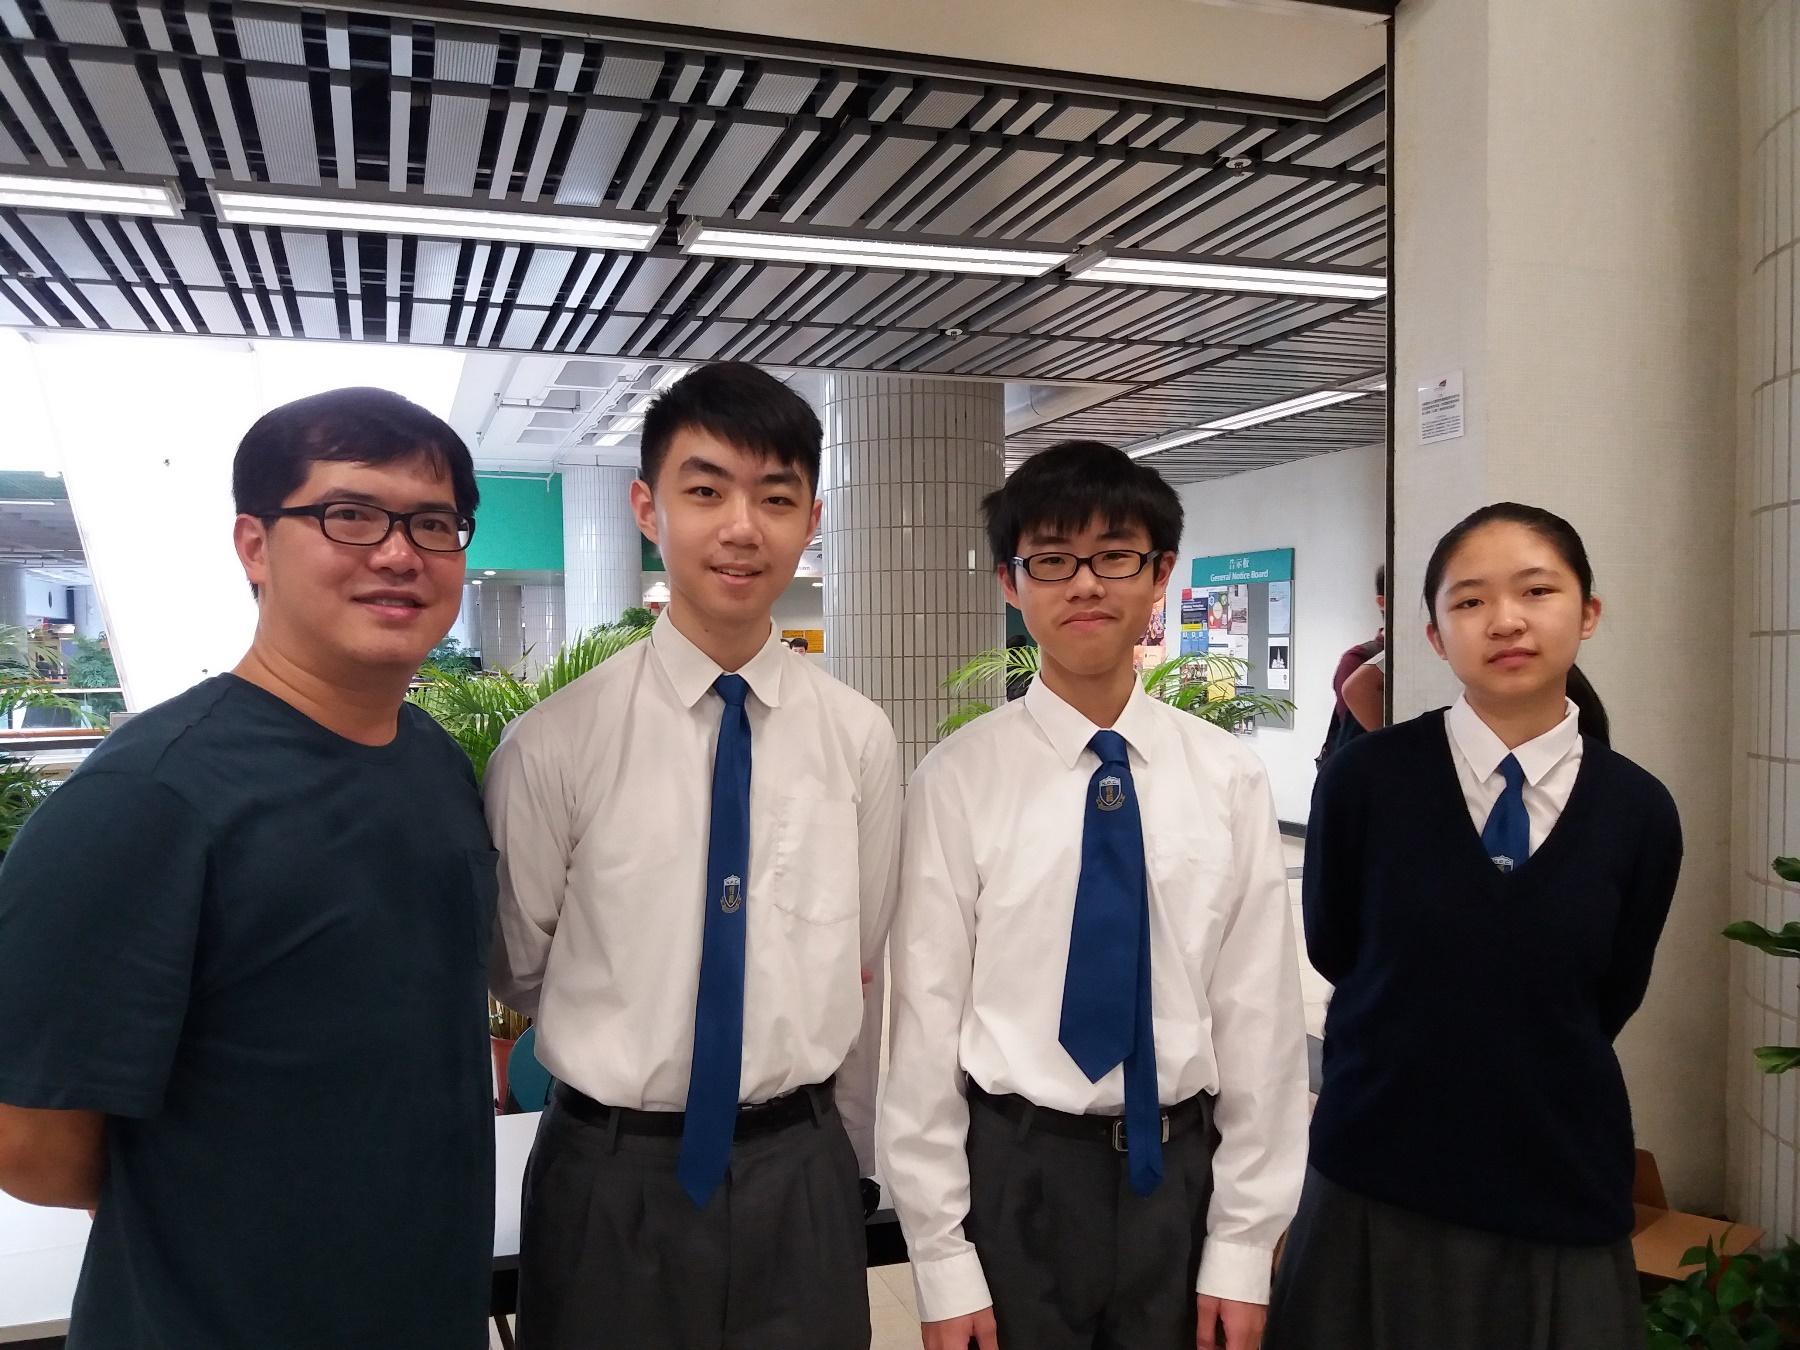 http://npc.edu.hk/sites/default/files/20190407_105109.jpg